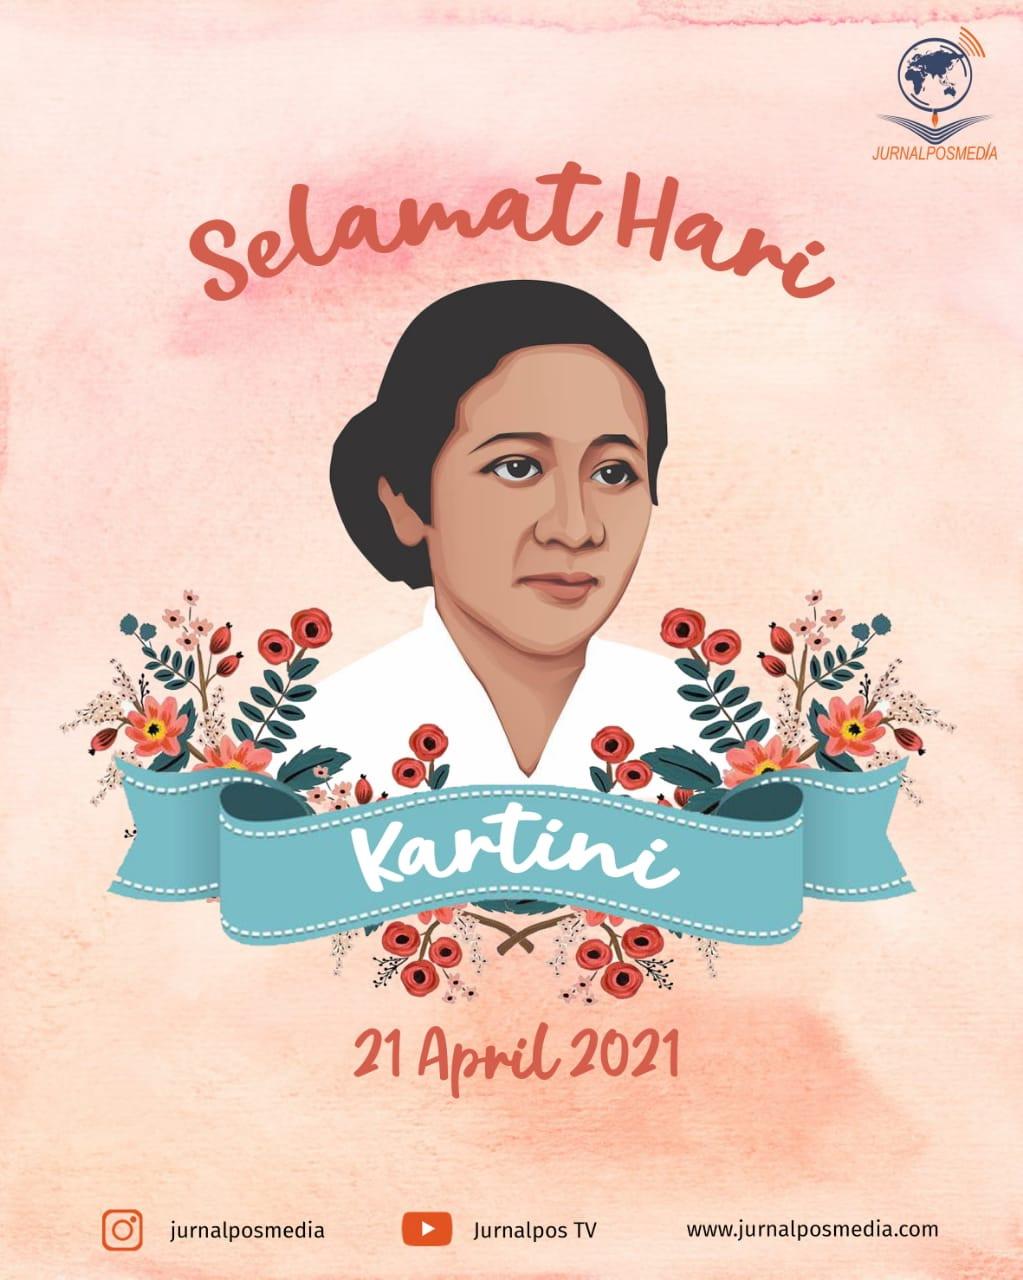 R.A Kartini